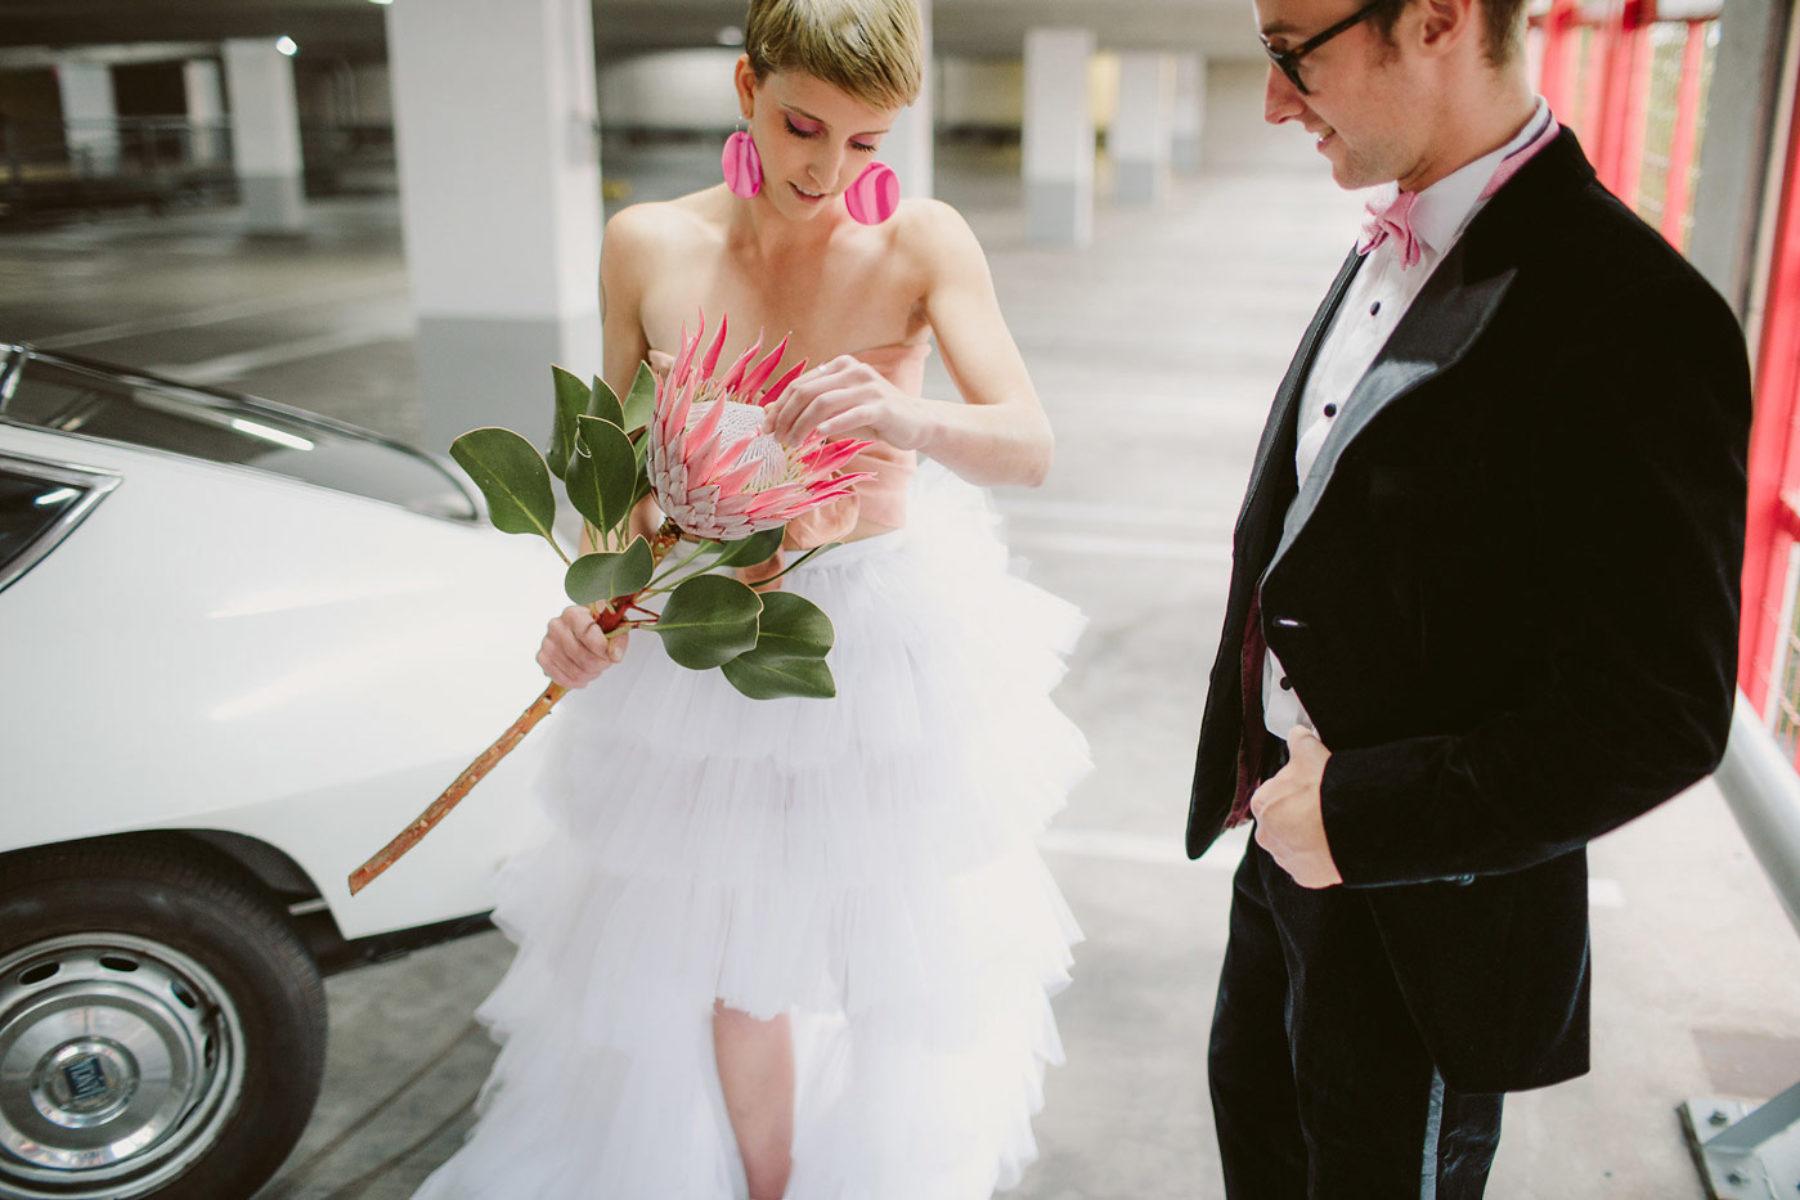 adelaide-warehouse-party-wedding-29-1800x0-c-default.jpg